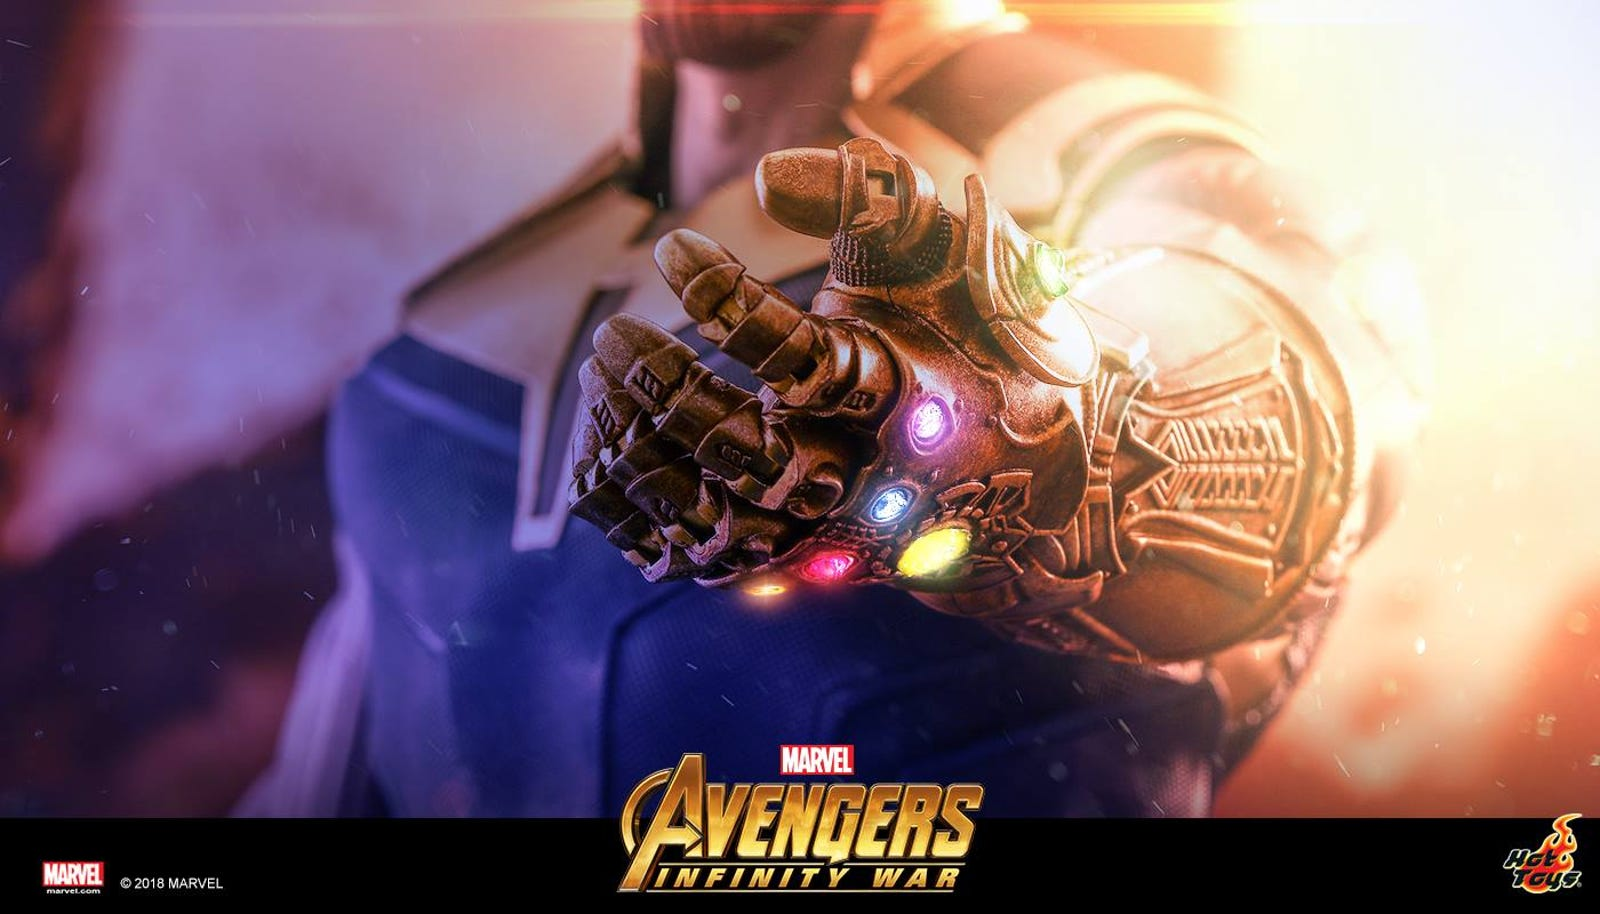 A partial glimpse of Thanos. Photo: Hot Toys